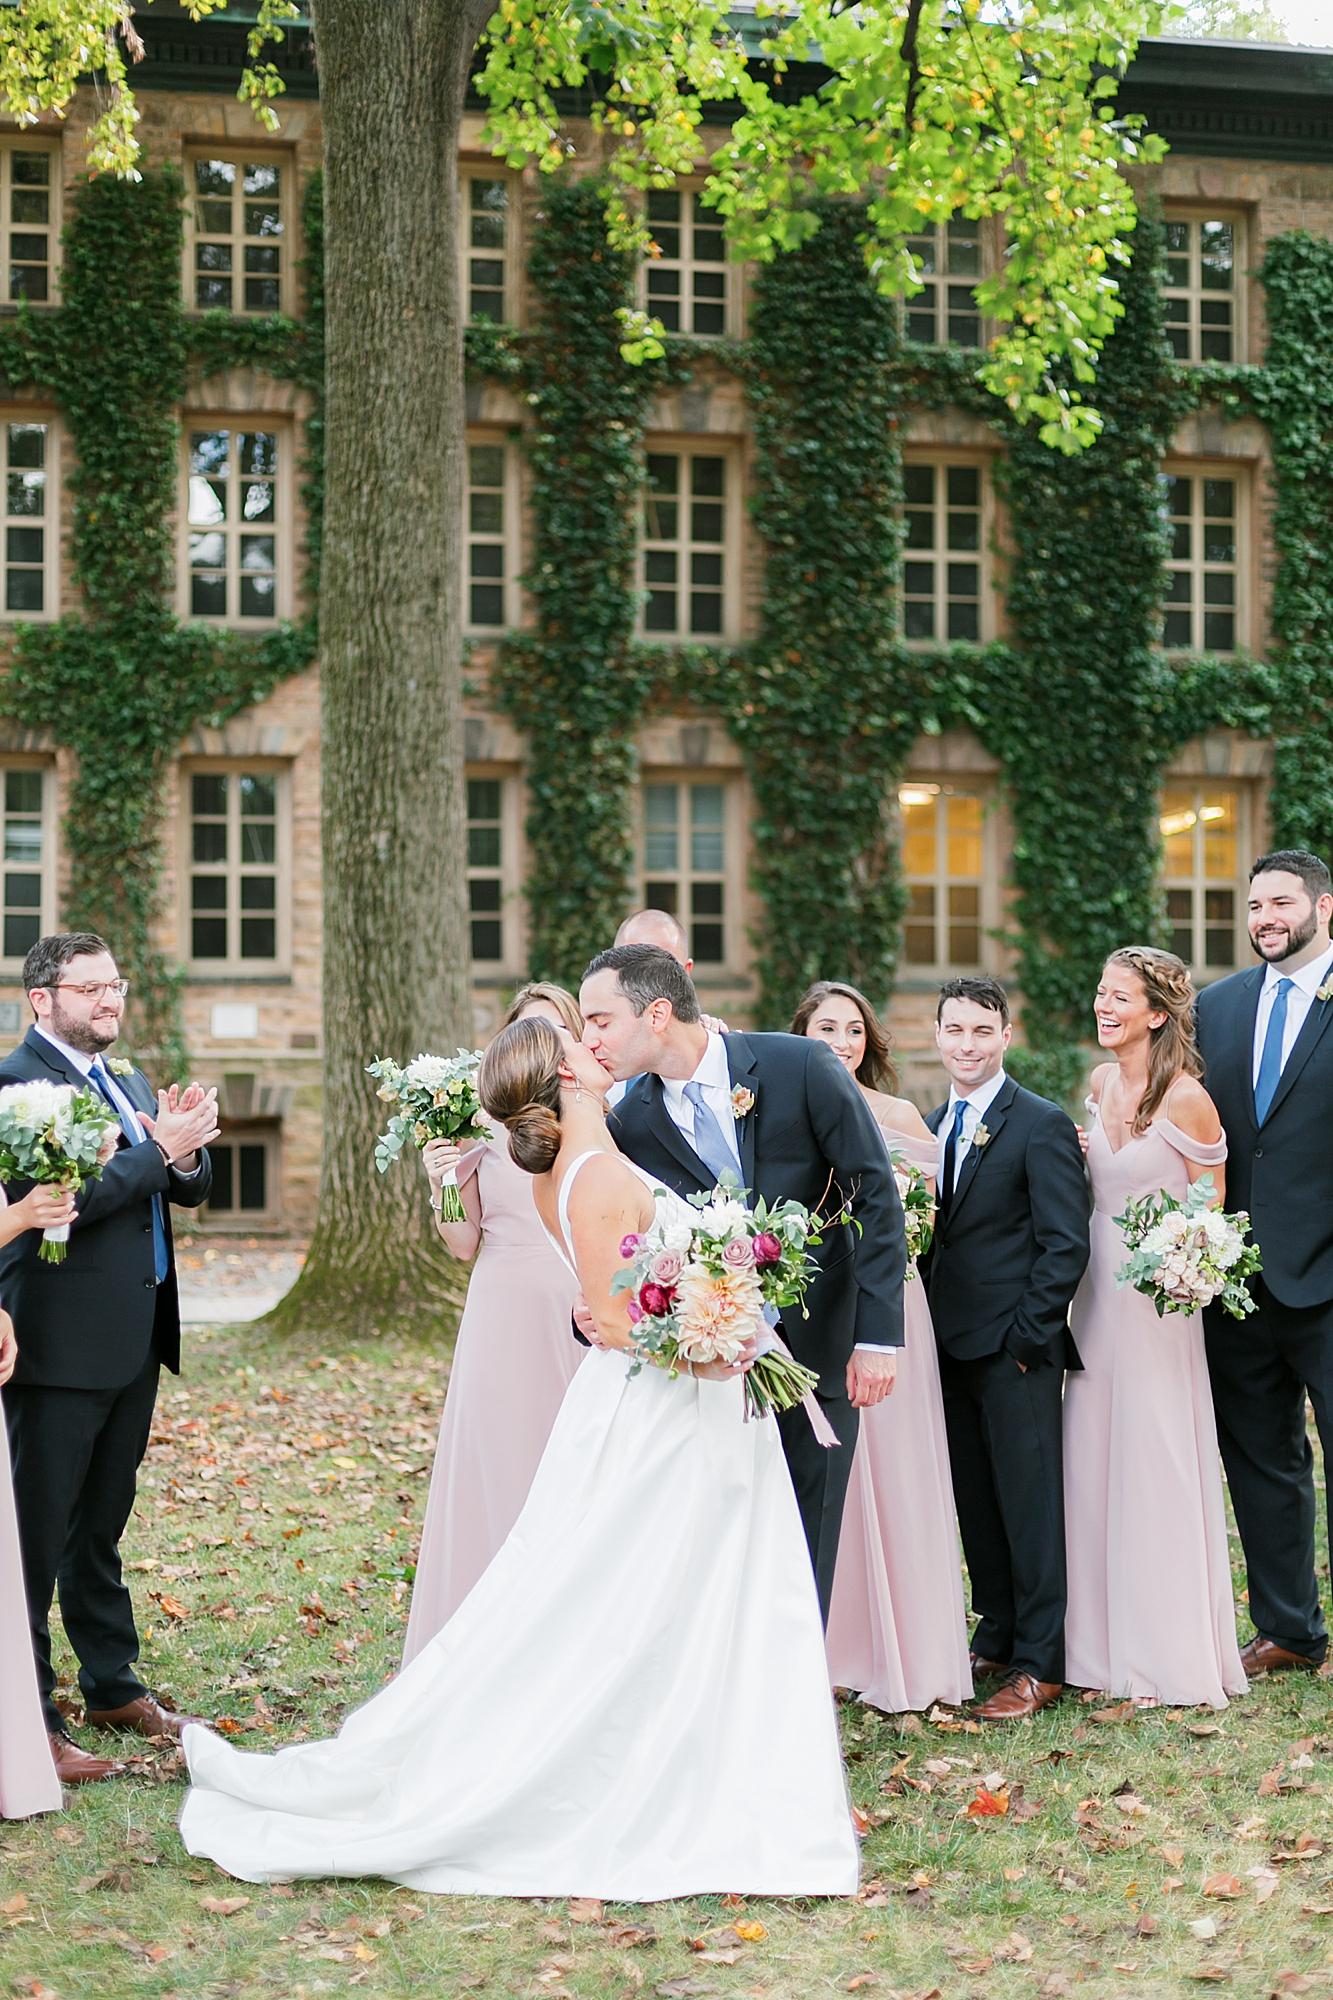 Princeton New Jersey Film Wedding Photographer Princeton University Wedding Photography by Magdalena Studios NJ Wedding Photographer20